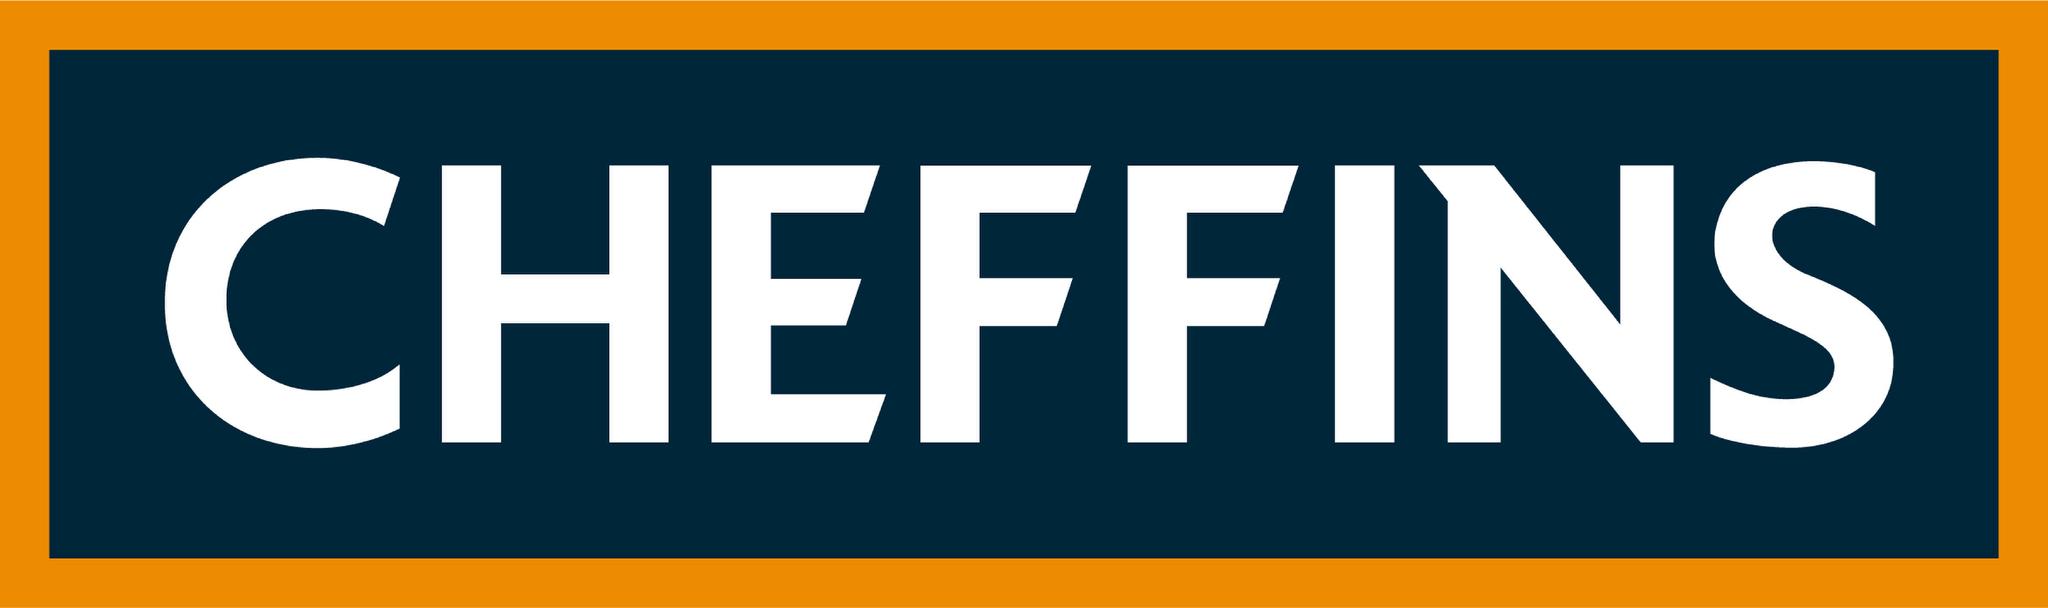 The World of Cheffins Machinery